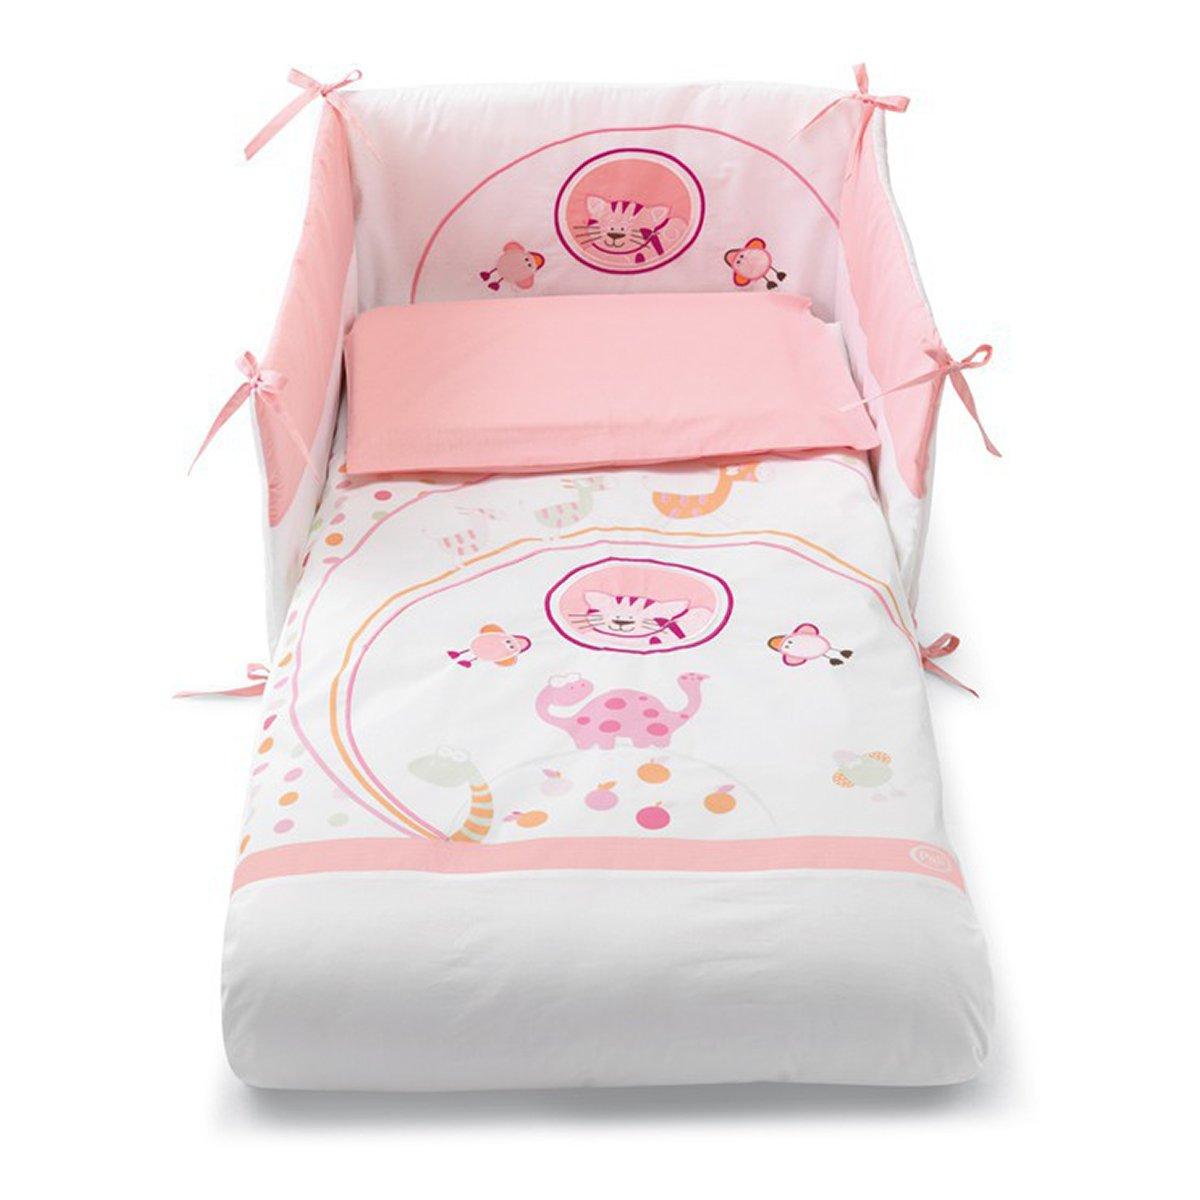 lenjerie de pat copii pali 4 piese zenzero, rosa